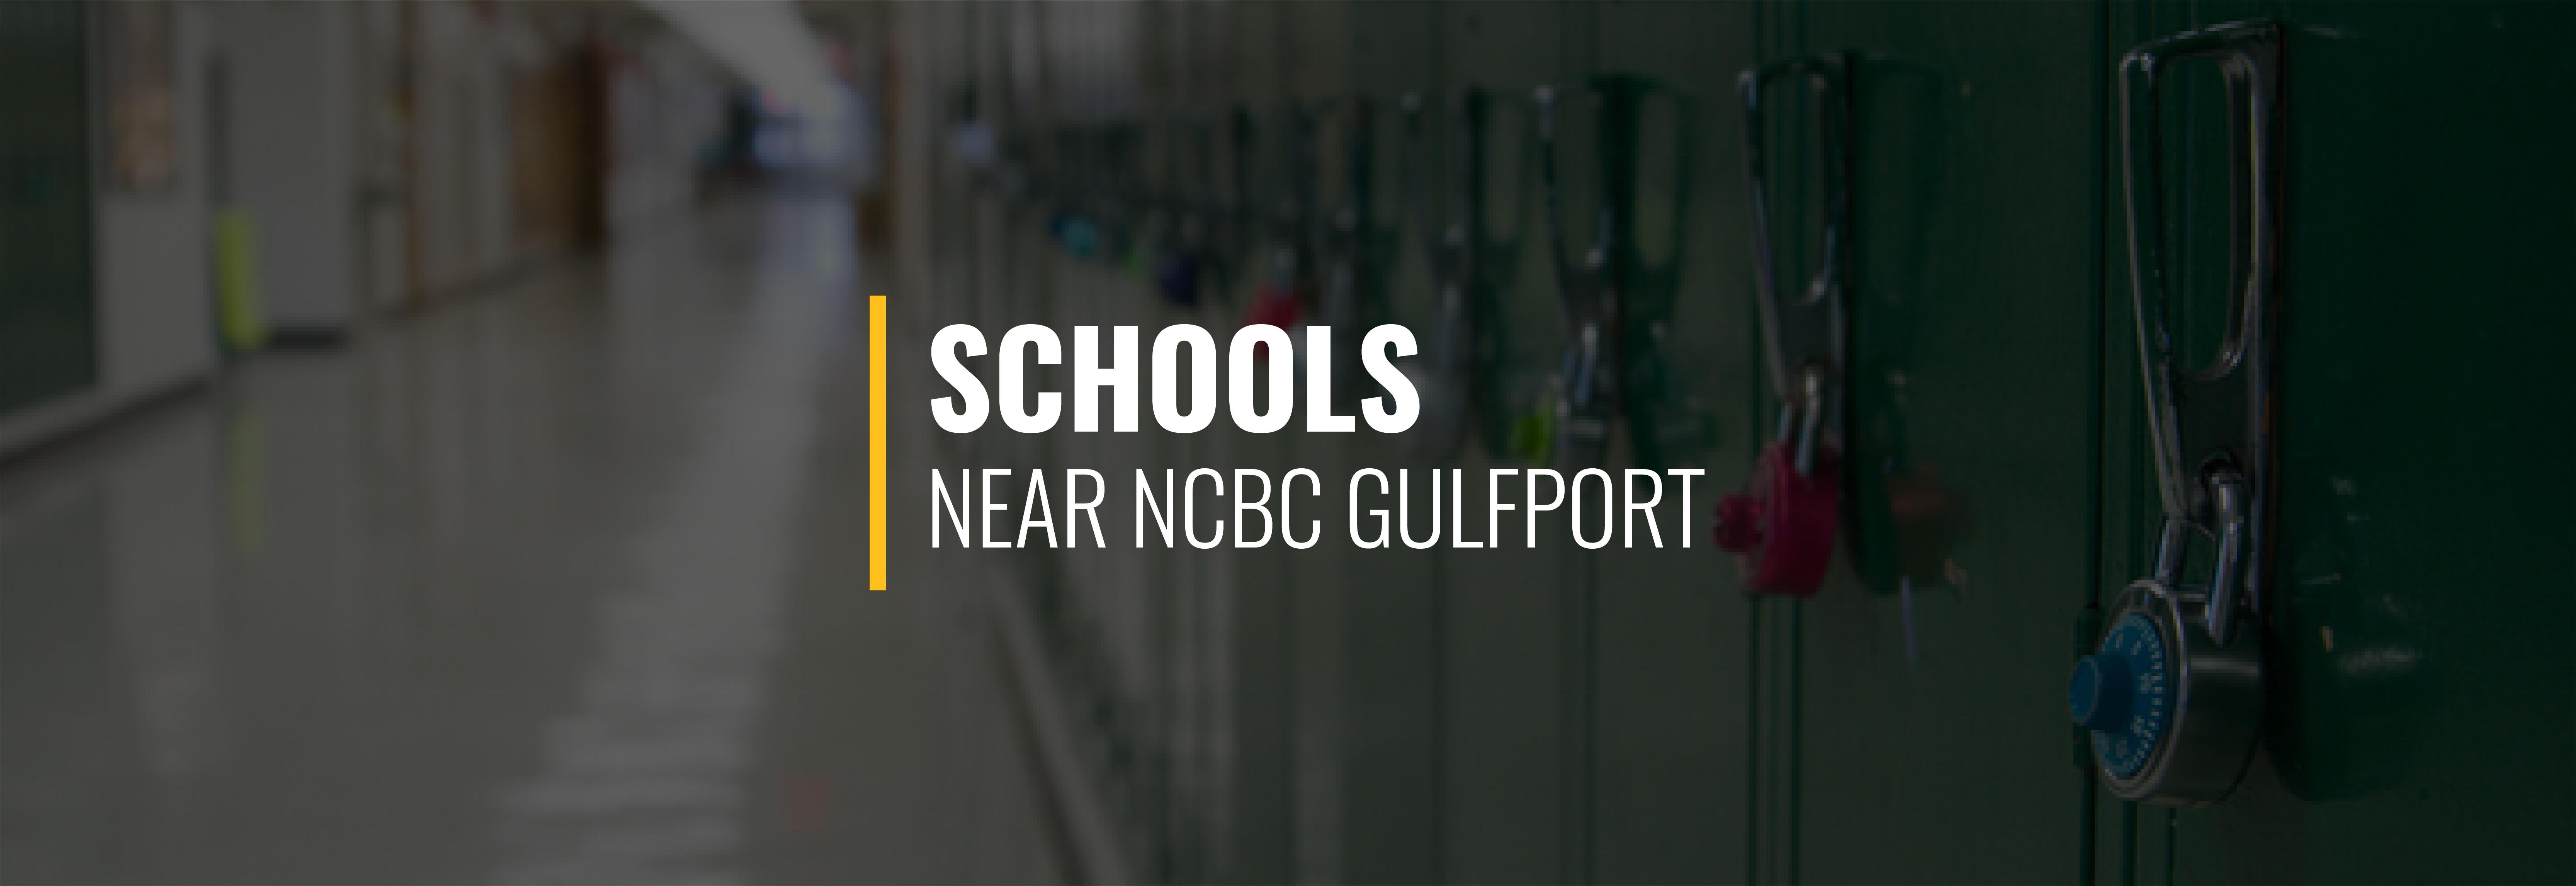 NCBC Gulfport Schools